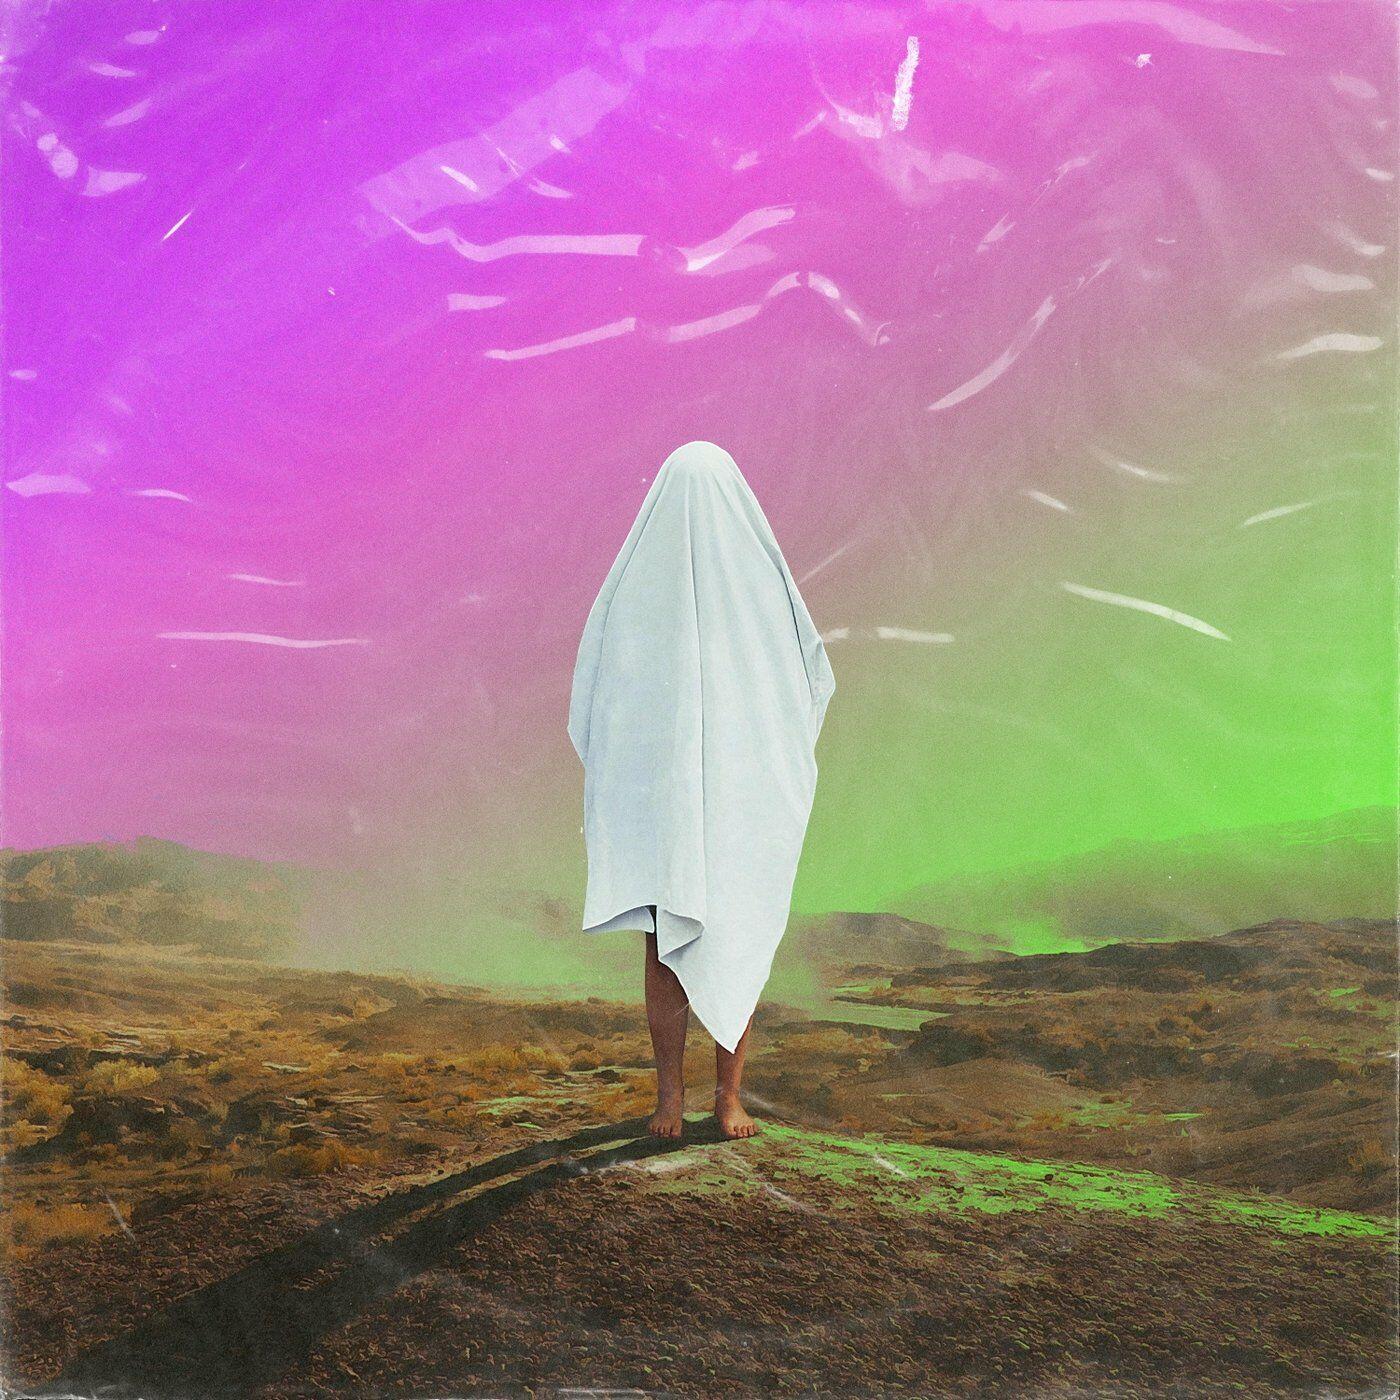 Glass Tides - Truth Hurts [single] (2020)